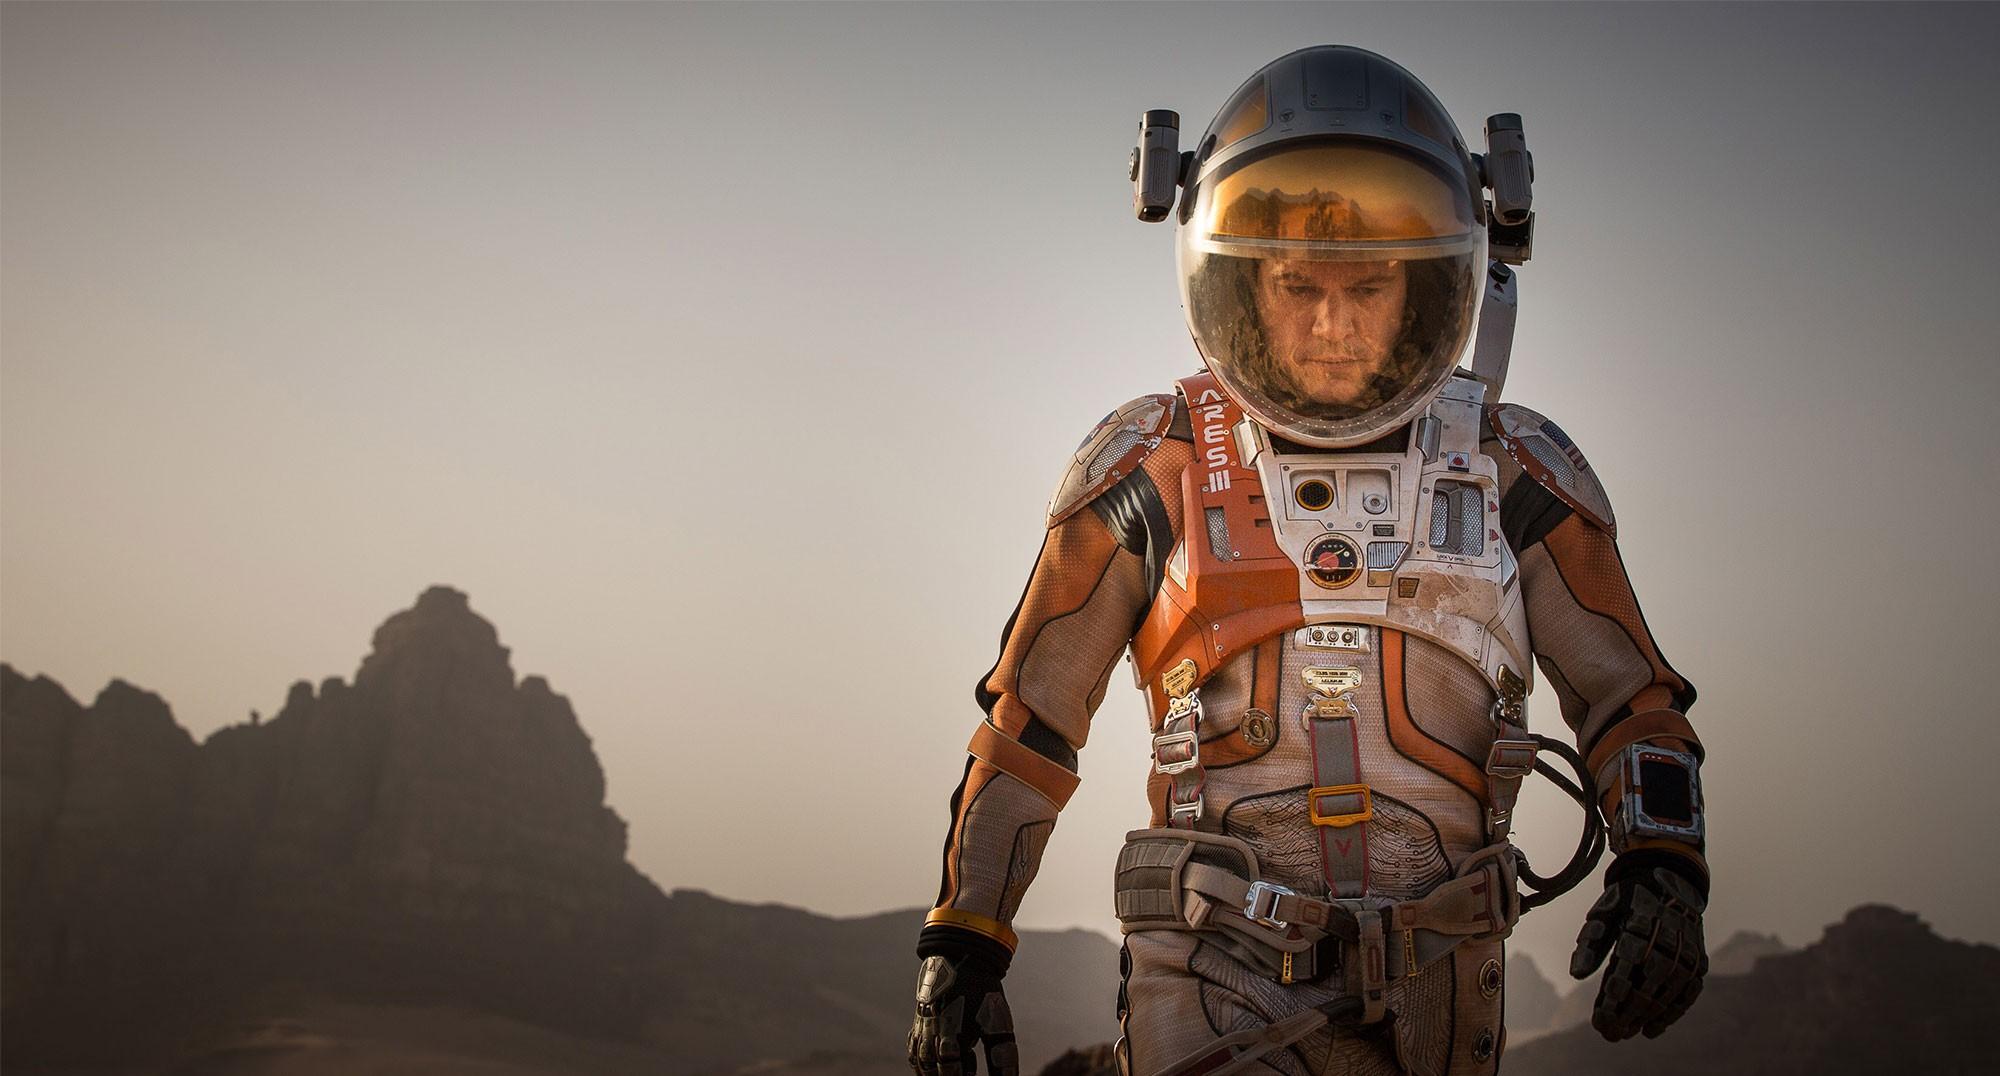 Matt Damon as stranded astronaut Mark Watney in 'The Martian'